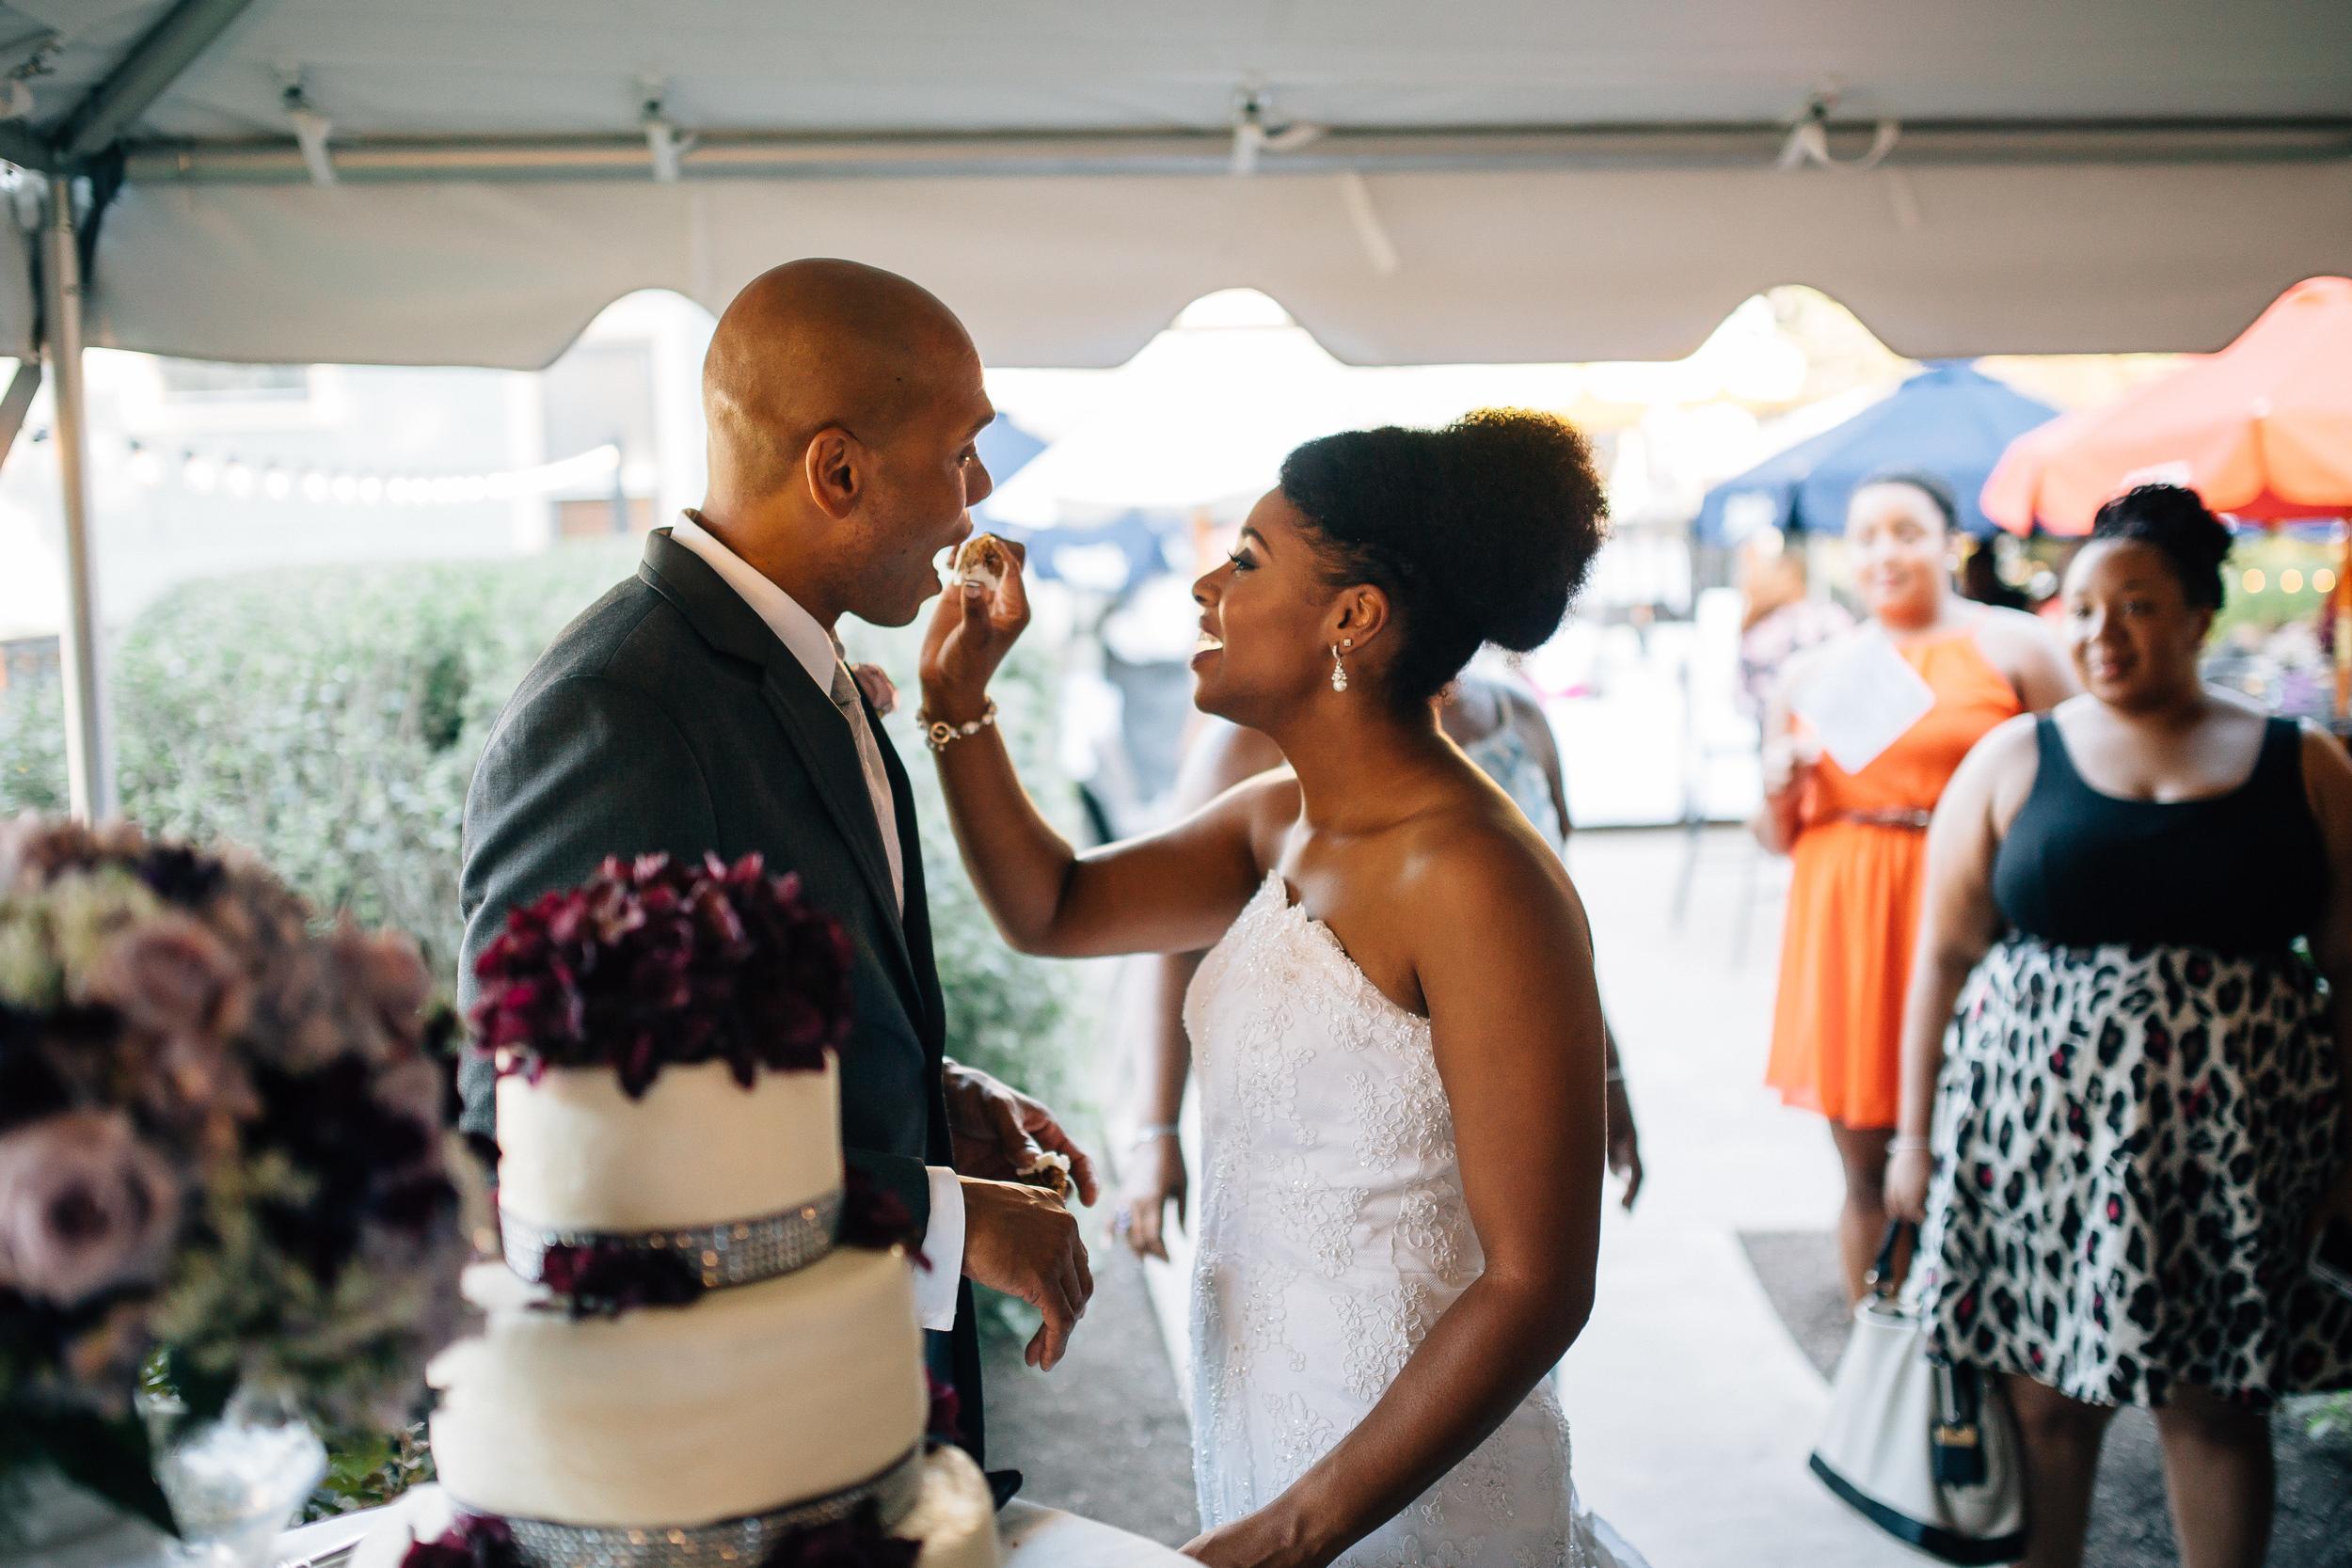 Chuck & Alicia's Wedding - Corrie Mick Photography-538.jpg